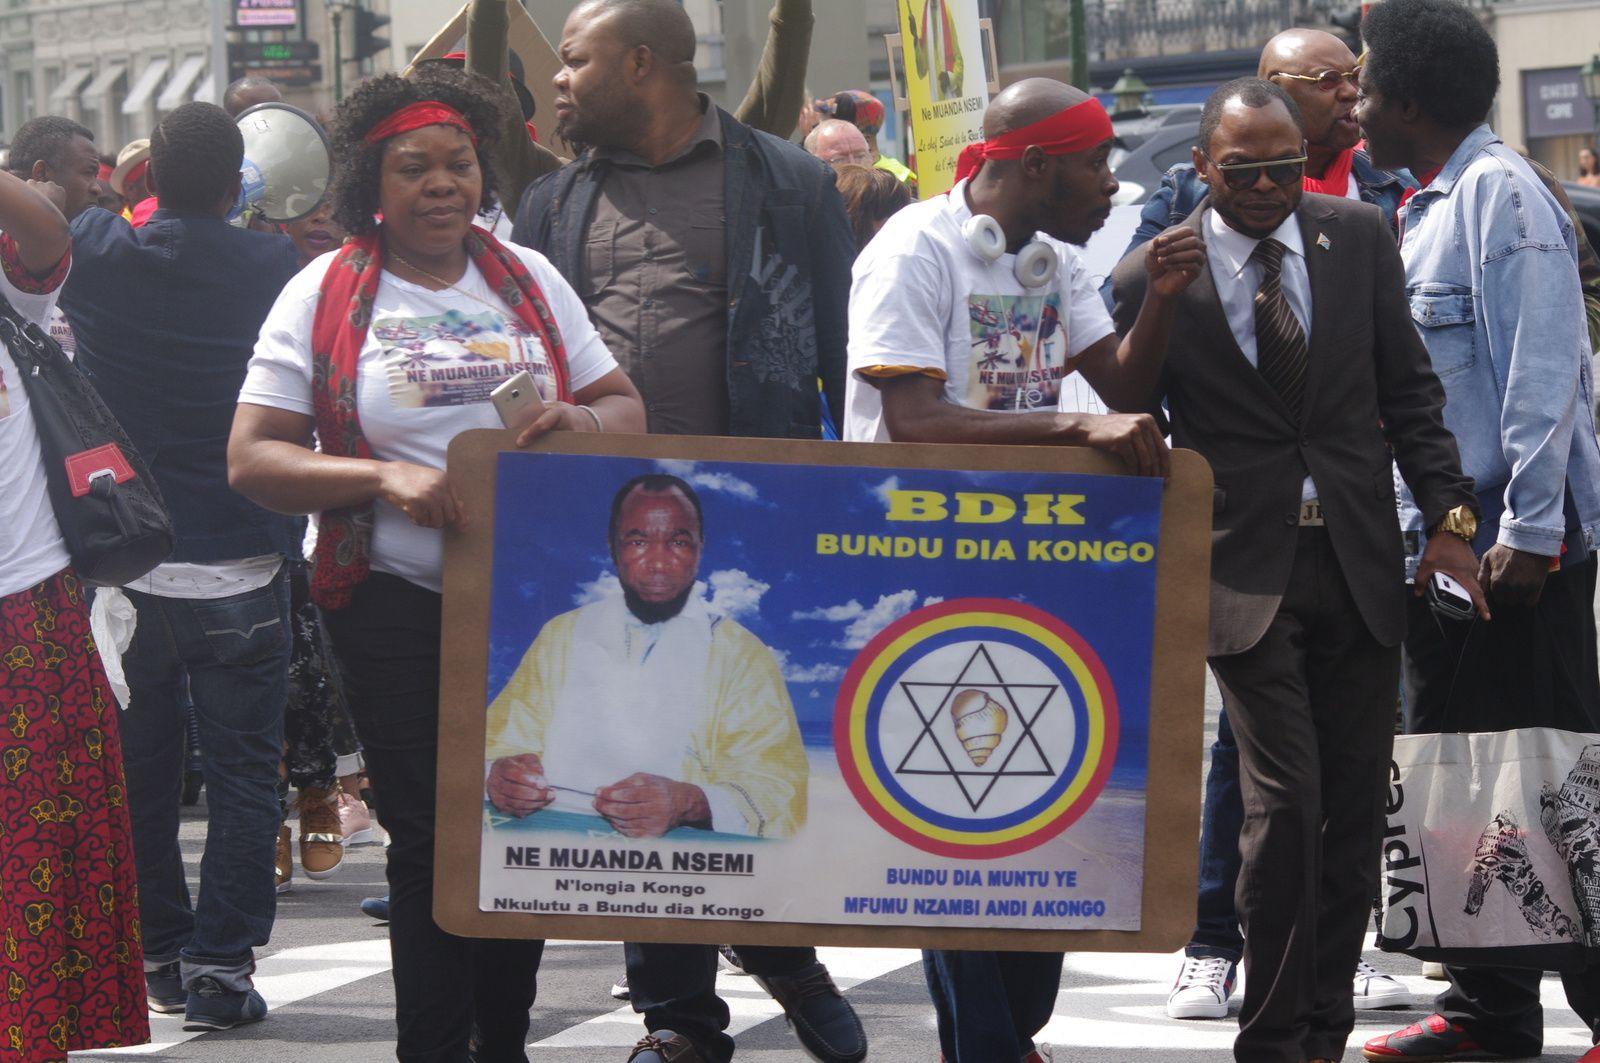 Cris de colère dans les rues de Bruxelles contre J. Kabila